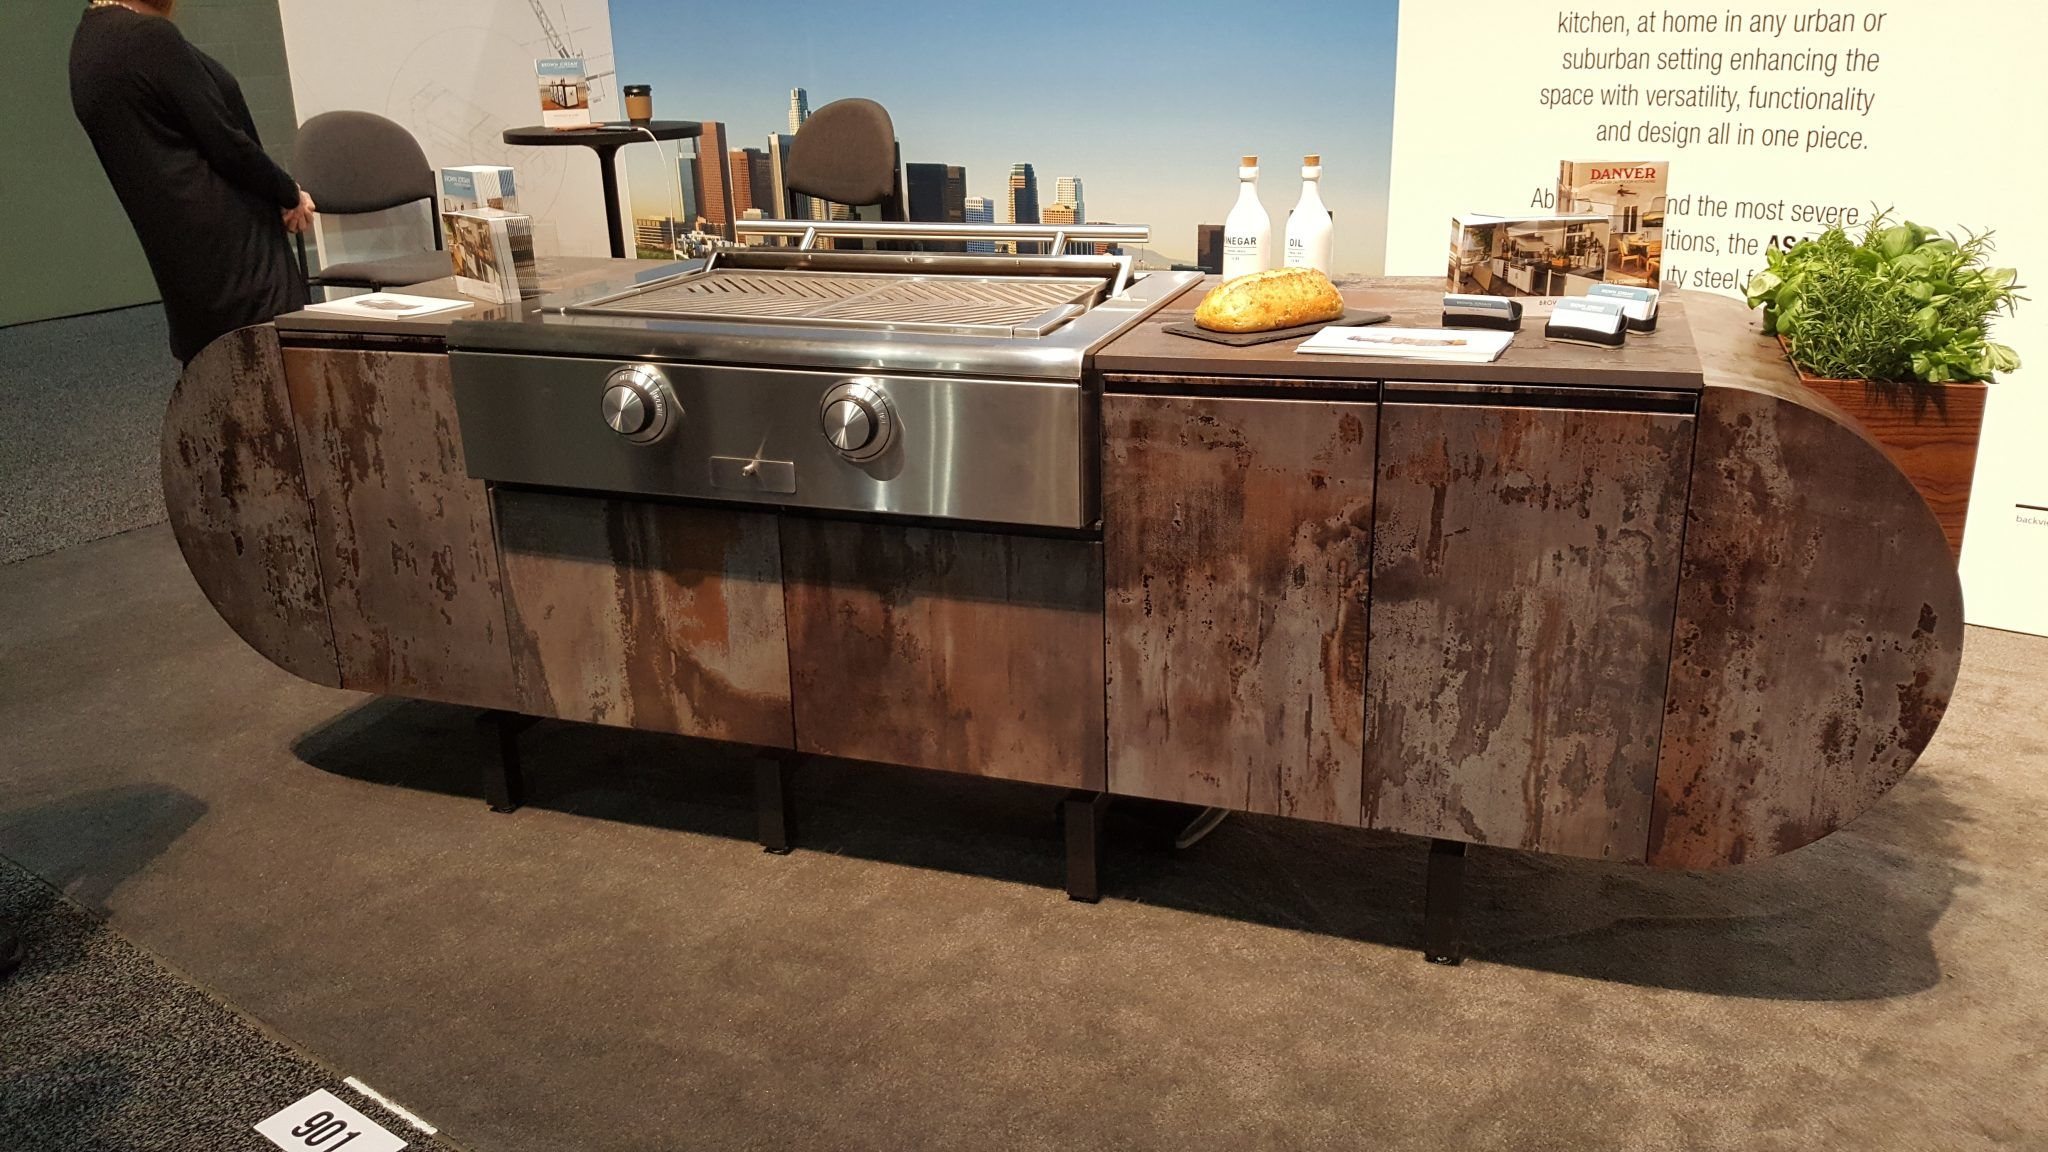 brown-jordan-stainless-steel-outdoor-kitchen-2-dwell-on-design-2018-los-angeles